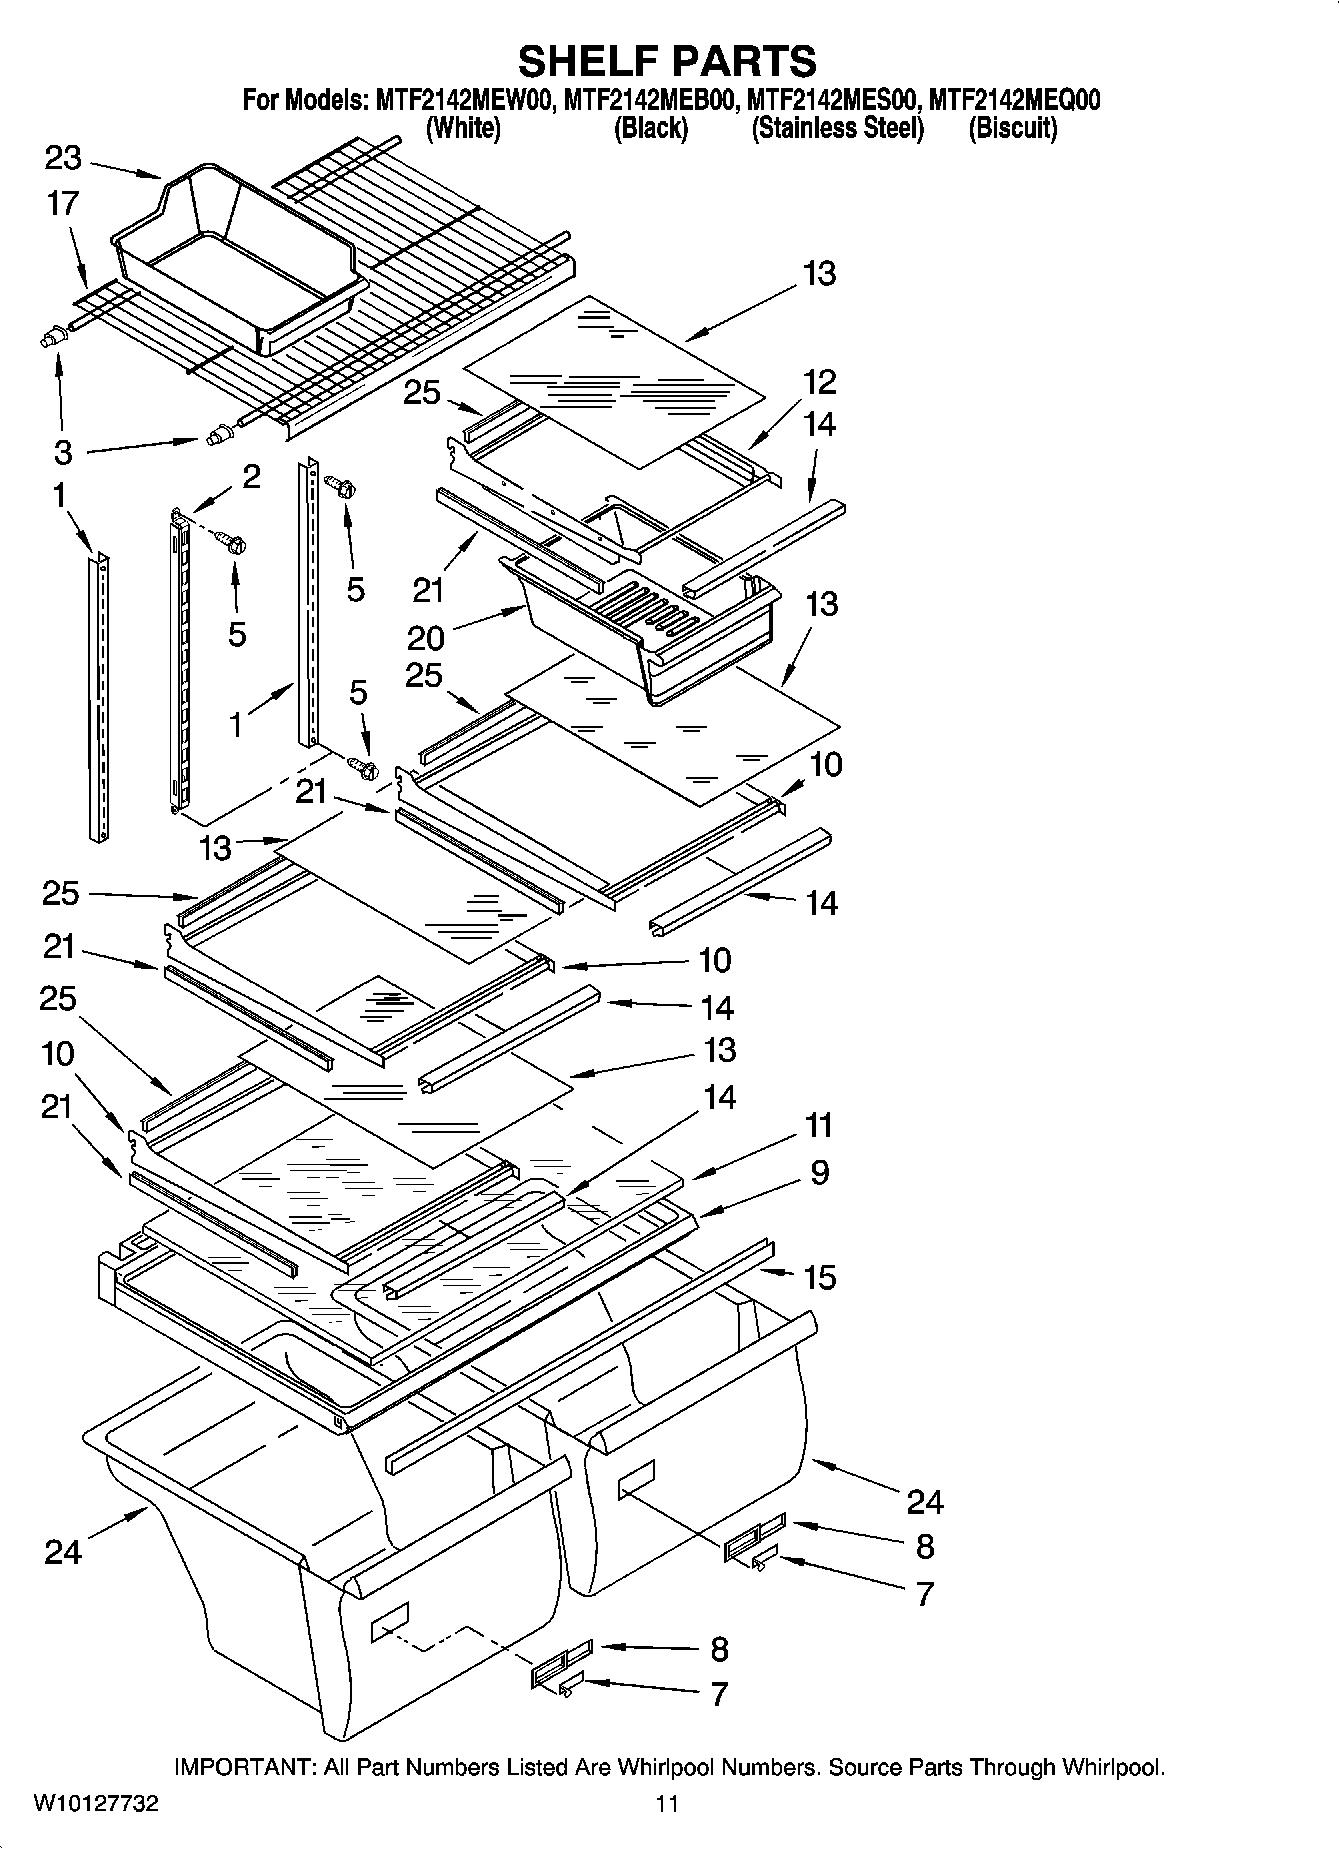 MTF2142MES00